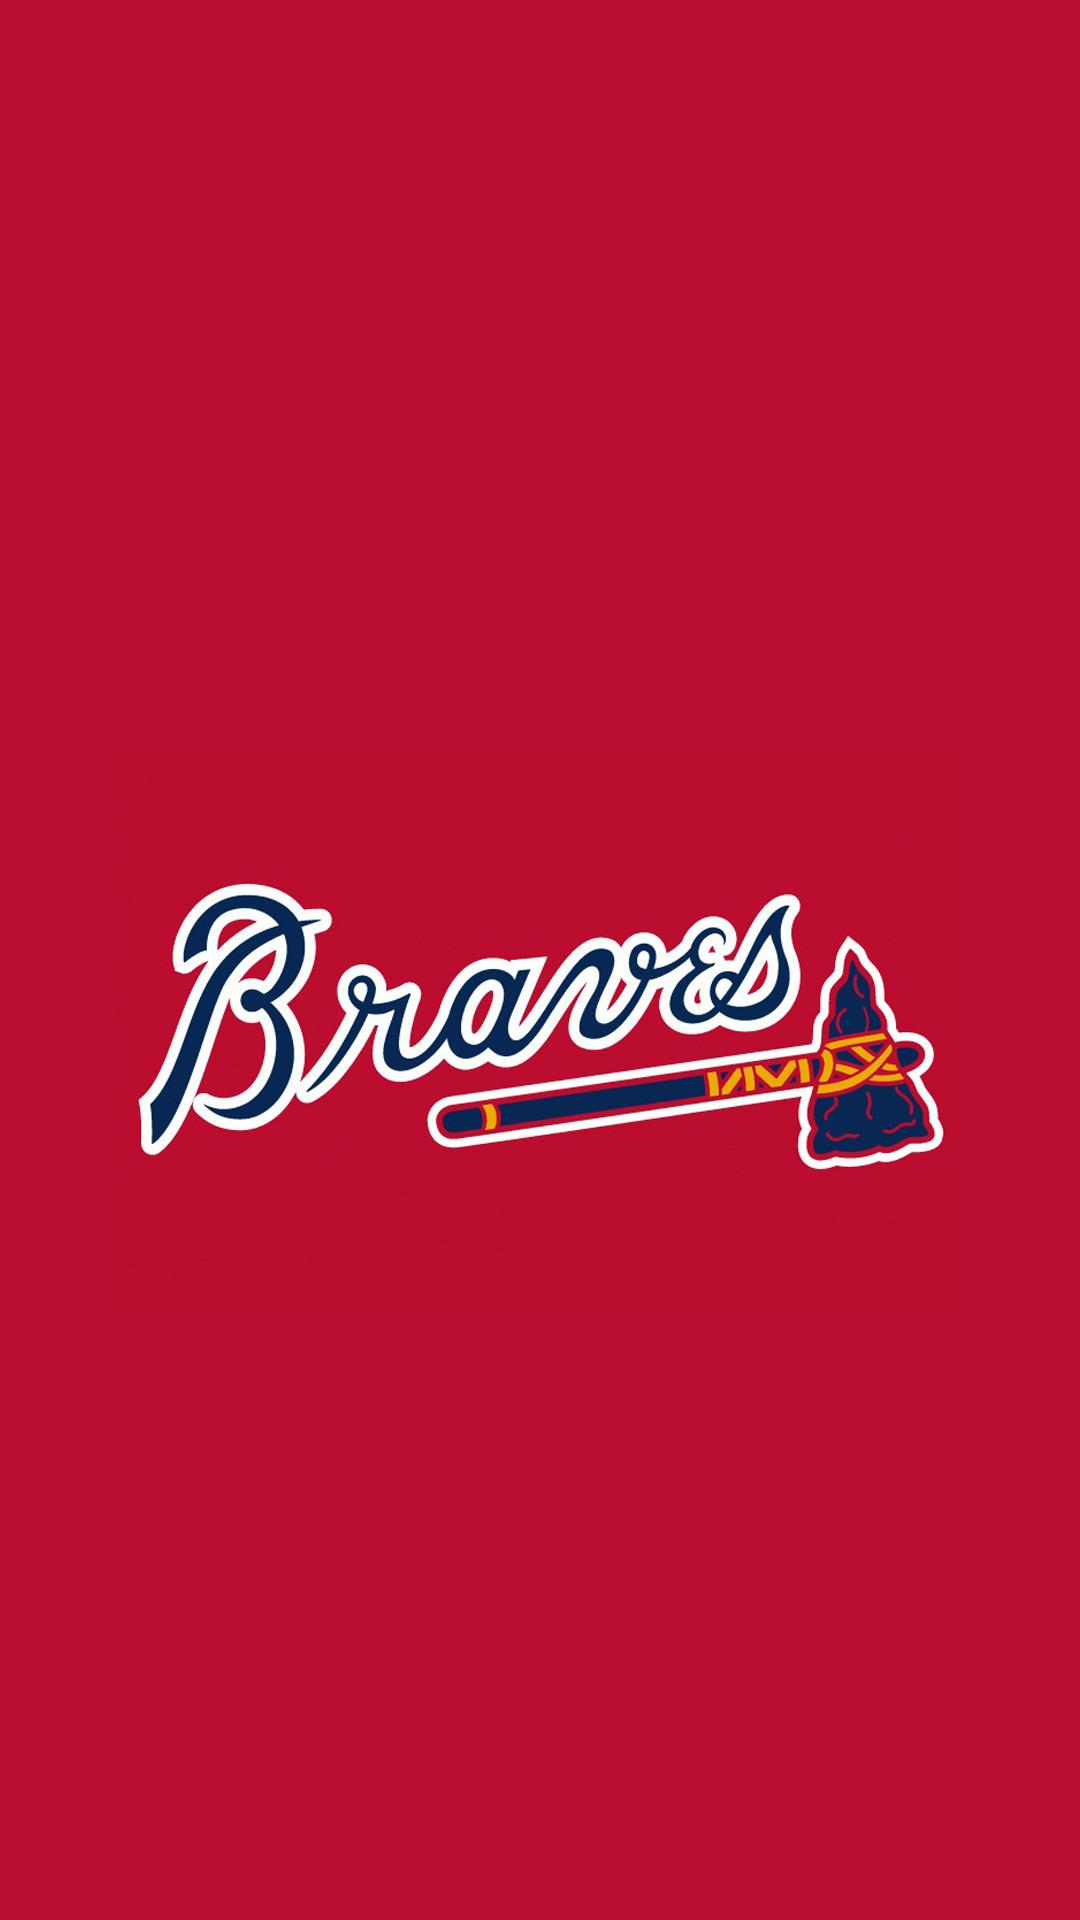 Atlanta Braves Wallpaper 2018 55 Images